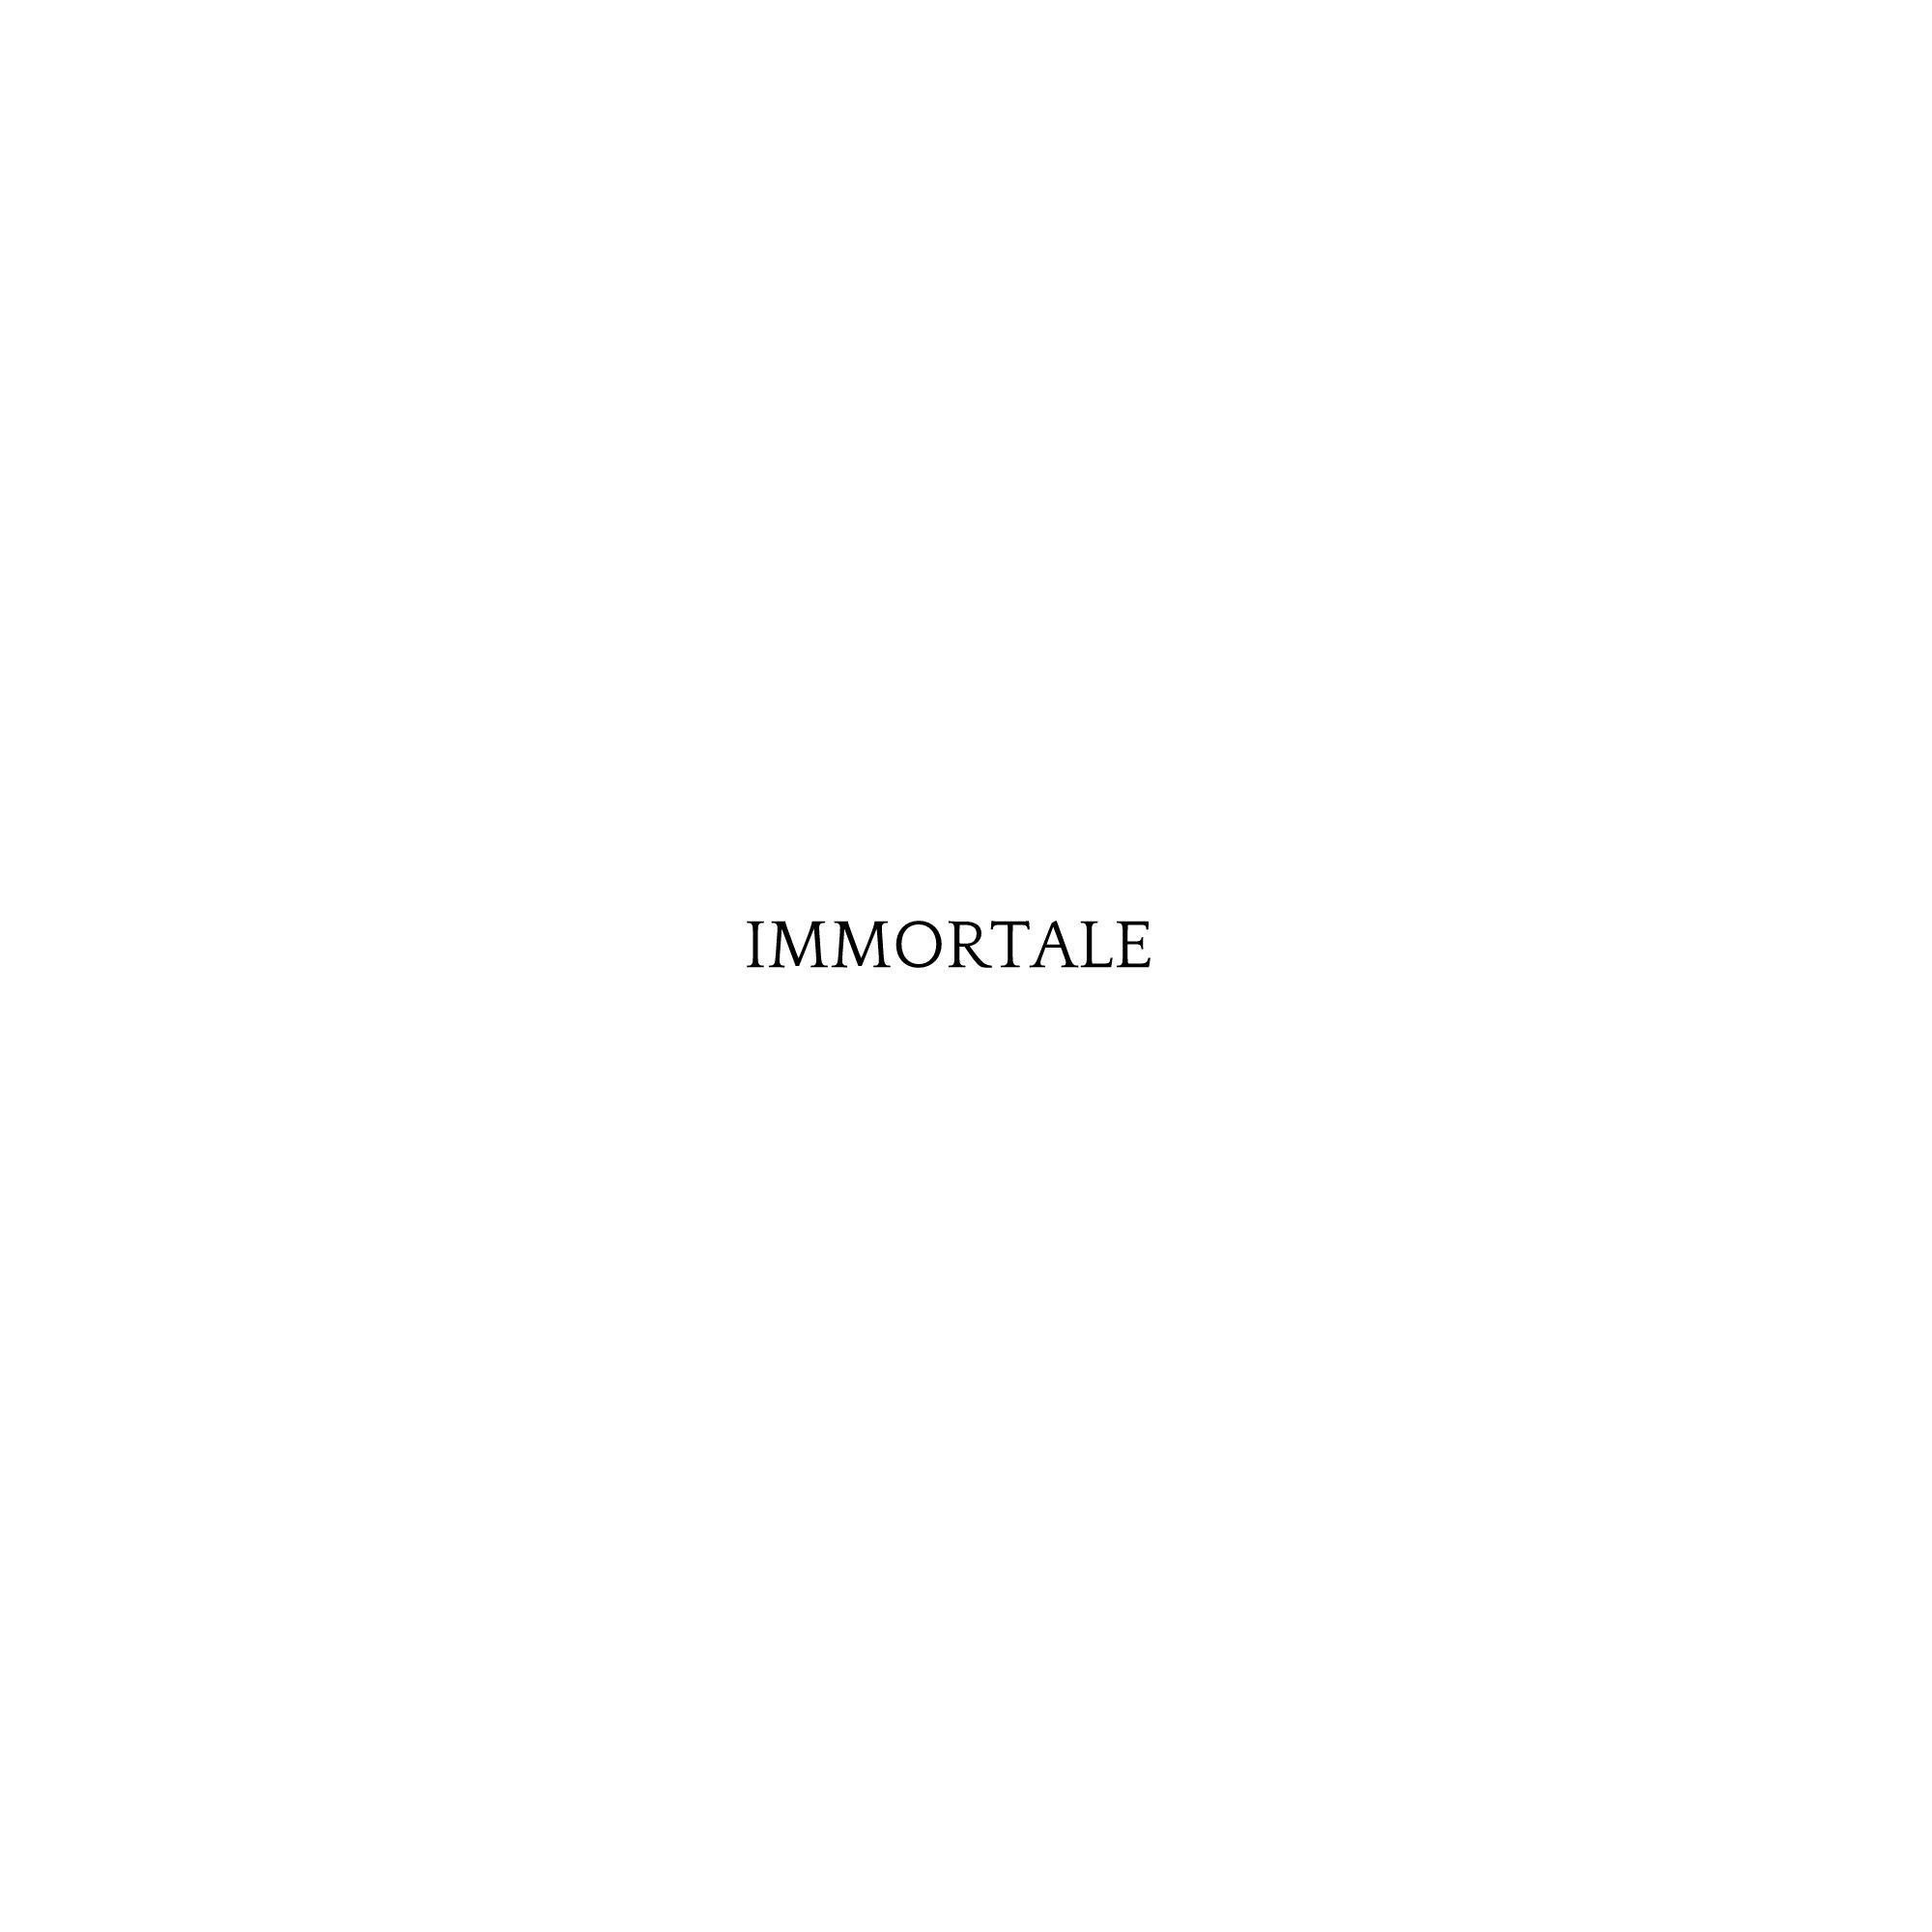 Immortale 2019 DJ set feb 2019 Dark & Rough 25-02-2019